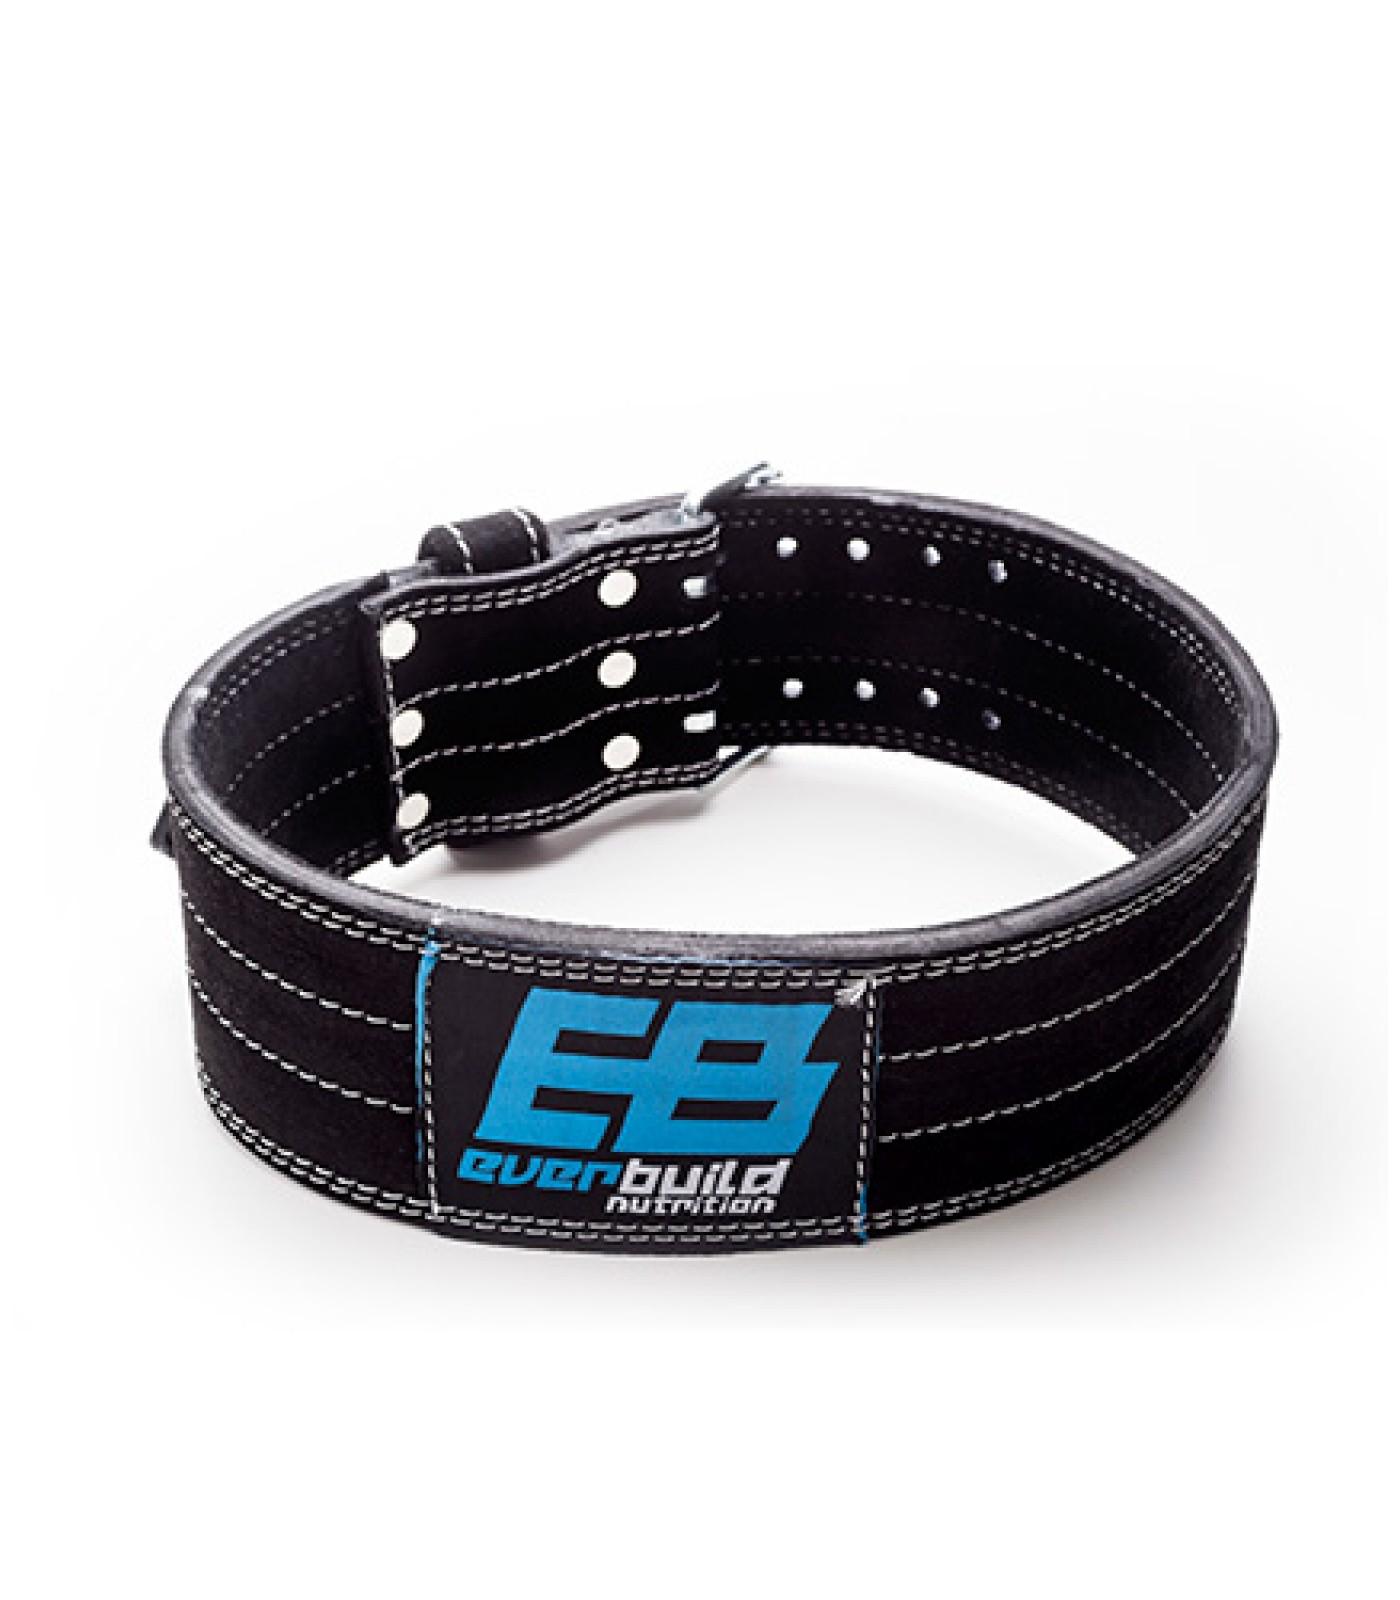 EVERBUILD - Triathlon Lifting Belt